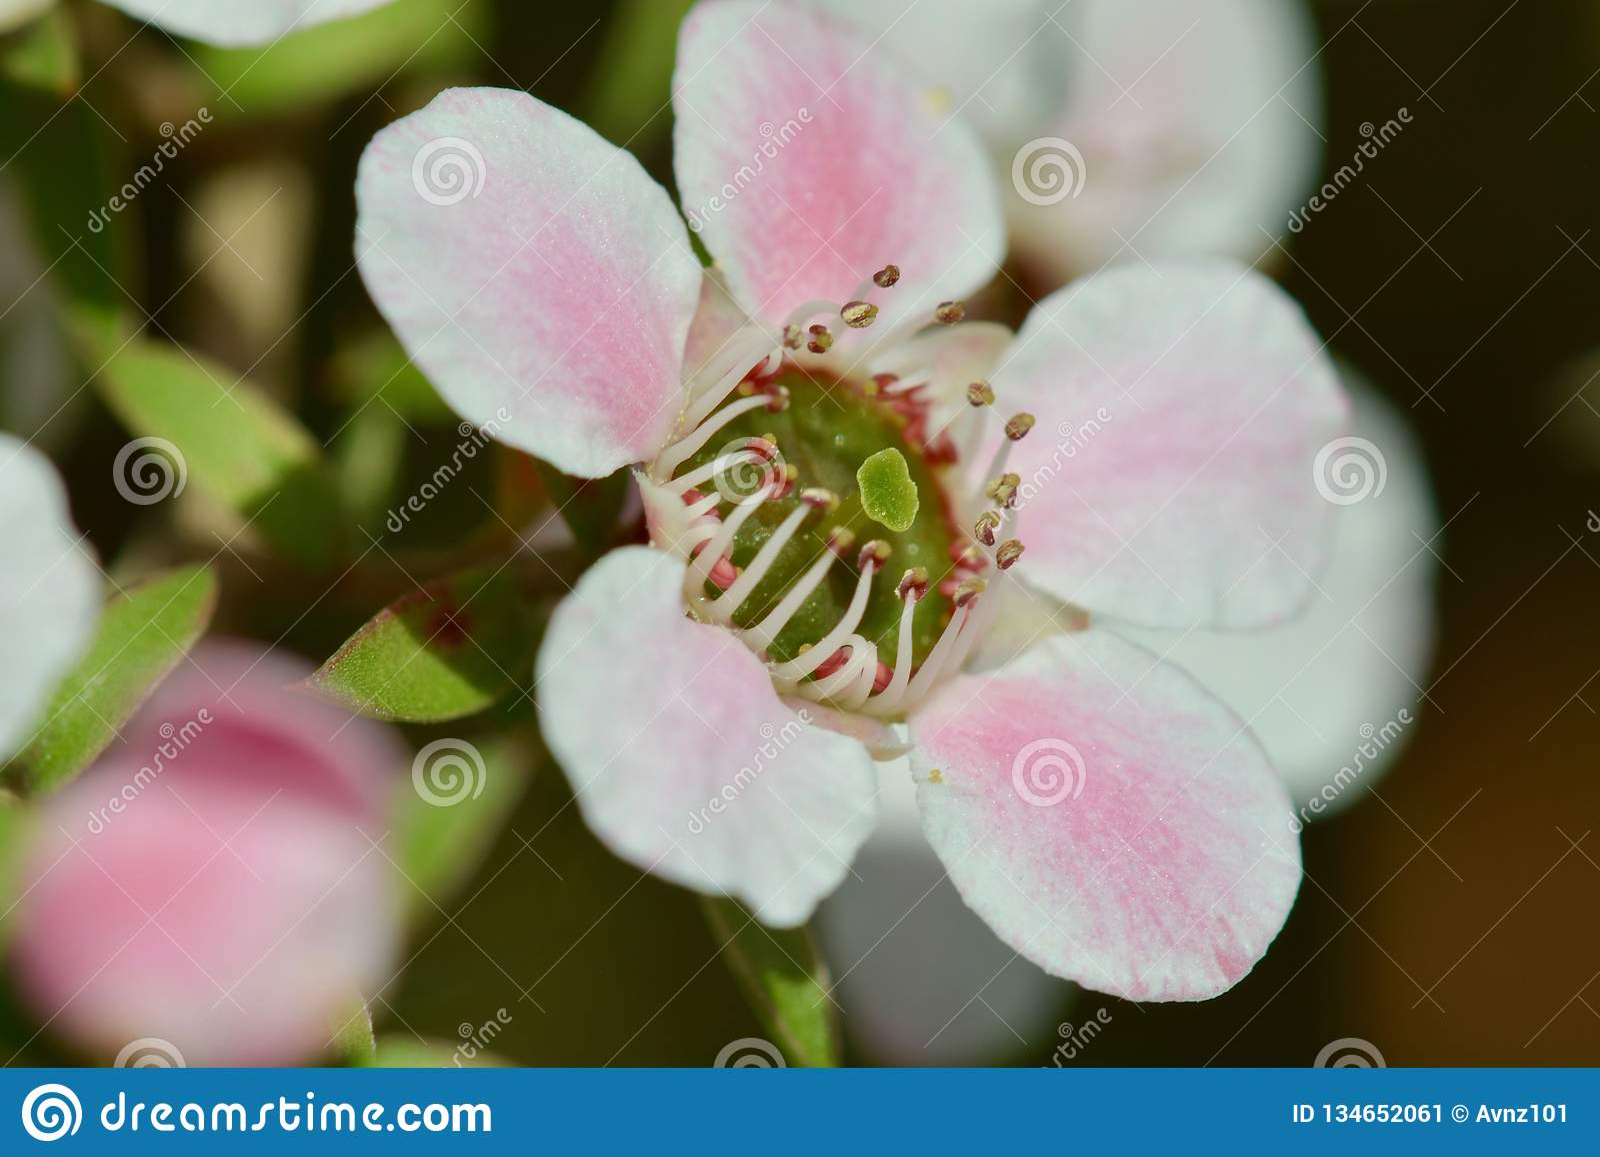 A macro photo of a beautiful Manuka flower Leptospermum scoparium, or New Zealand teatree, a source of wonderful Manuka honey